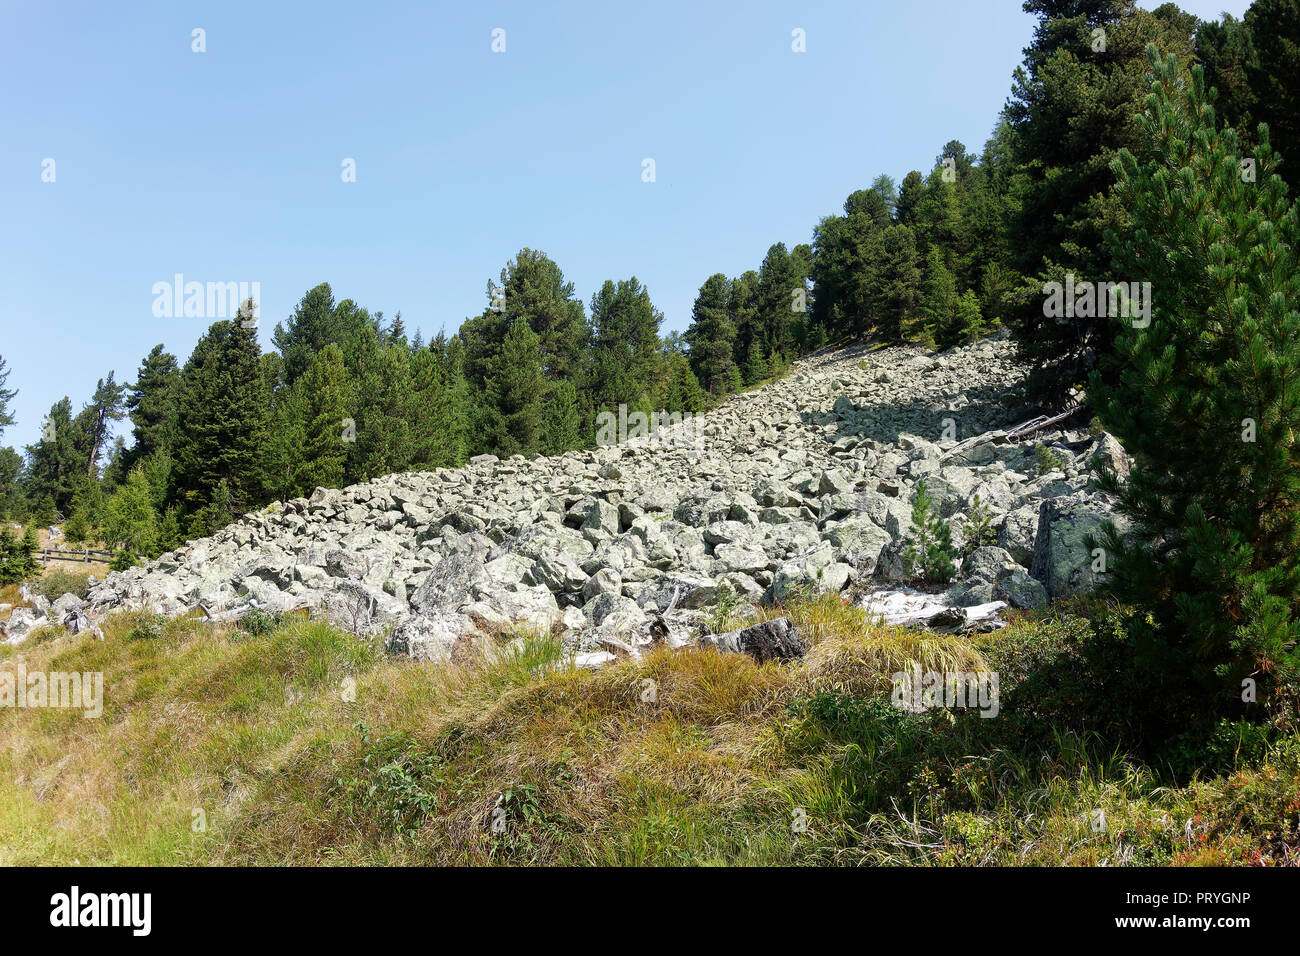 Departing landslide, Plamorter moss biotope, Reschenpass, Vinschgau, South Tyrol, Italy - Stock Image